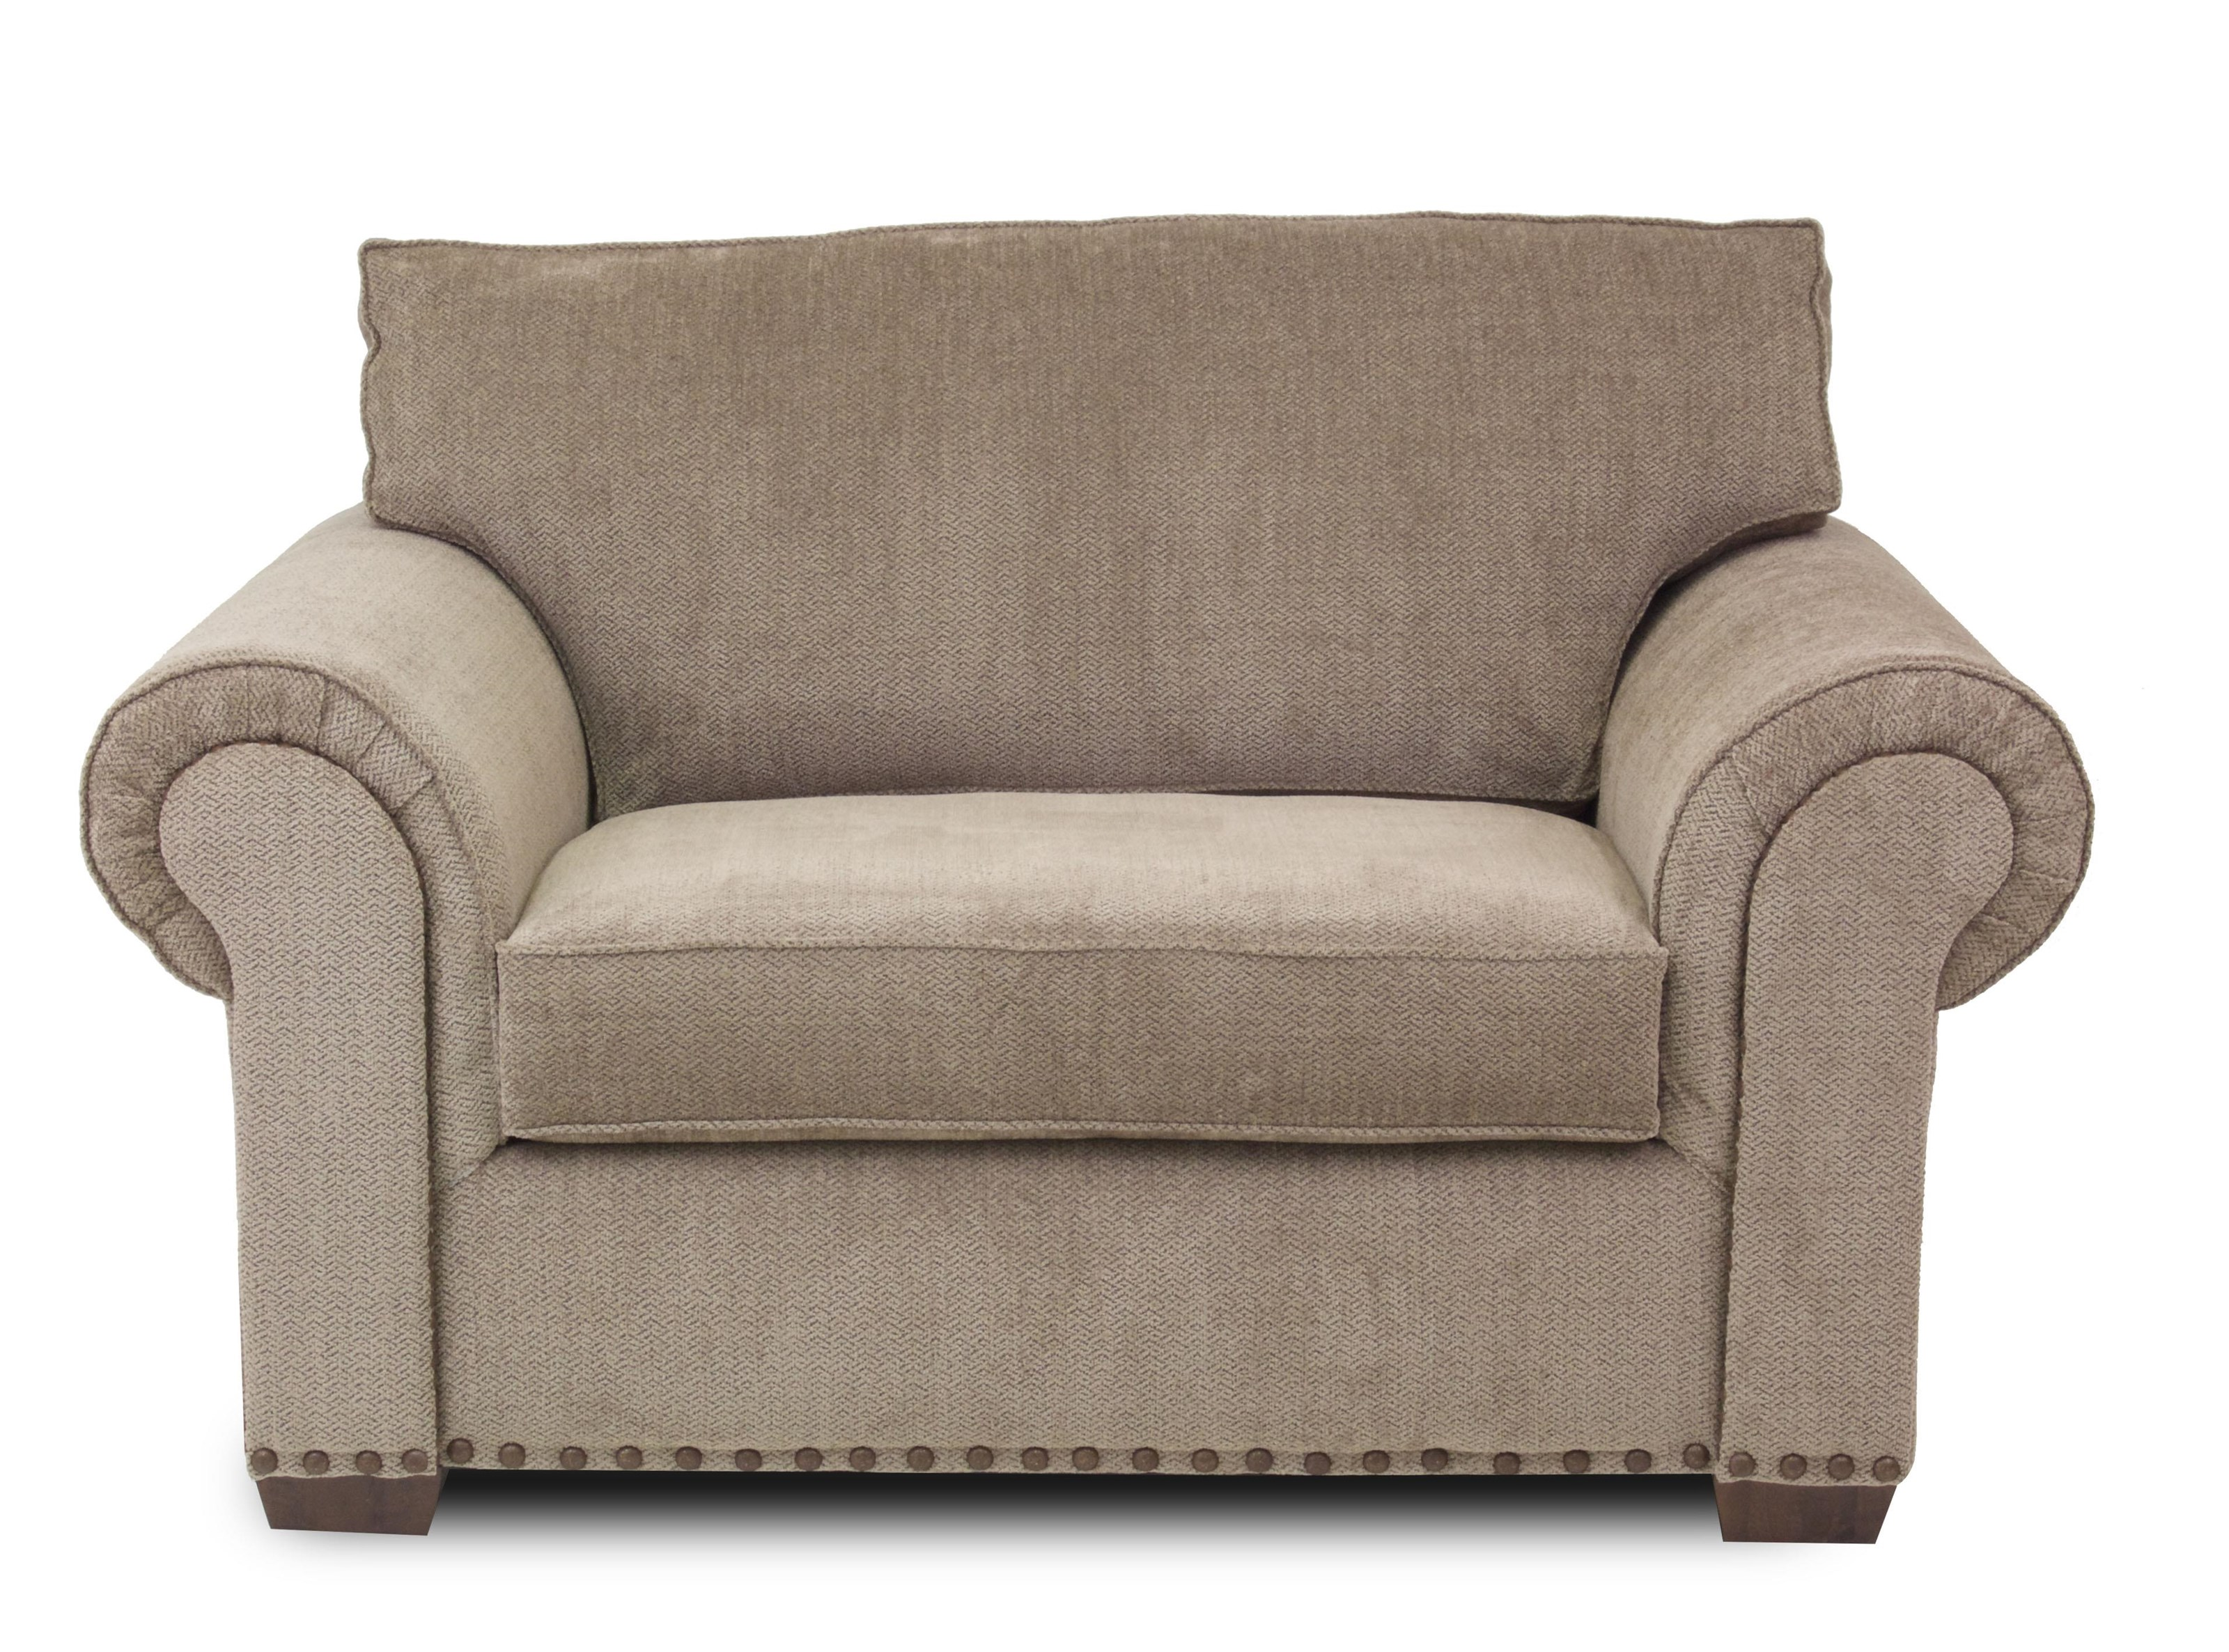 Metropia Terrance Chair and 1/2 - Item Number: 17707-C